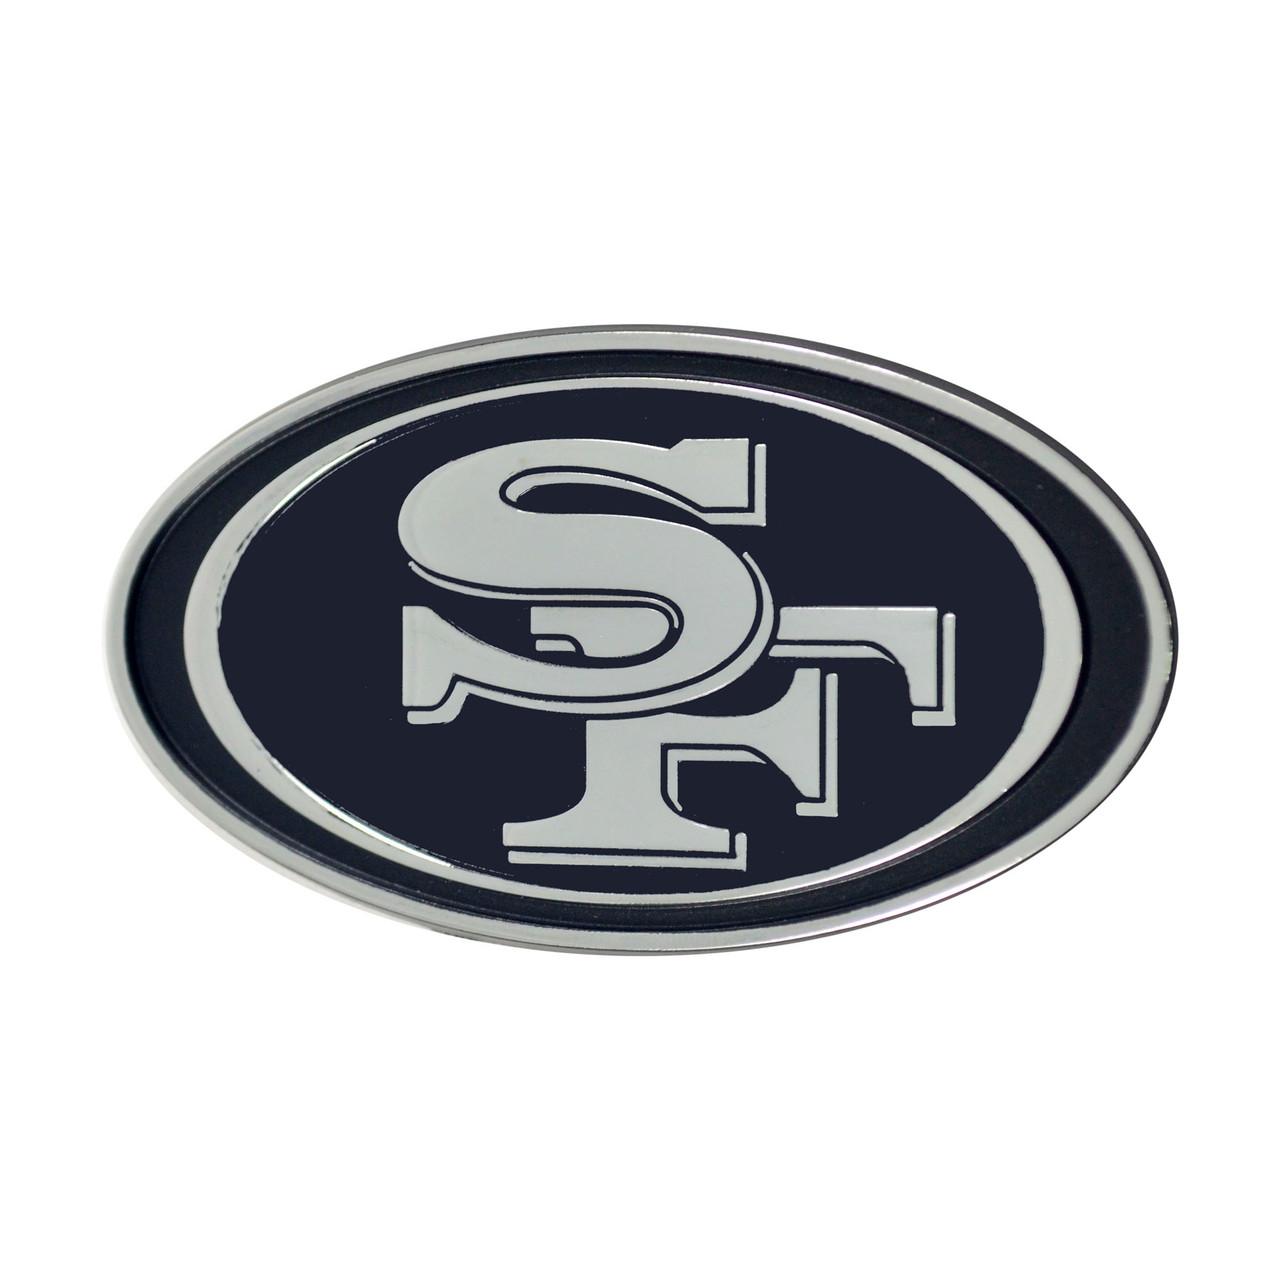 San Francisco 49ers Auto Emblem Premium Metal Chrome